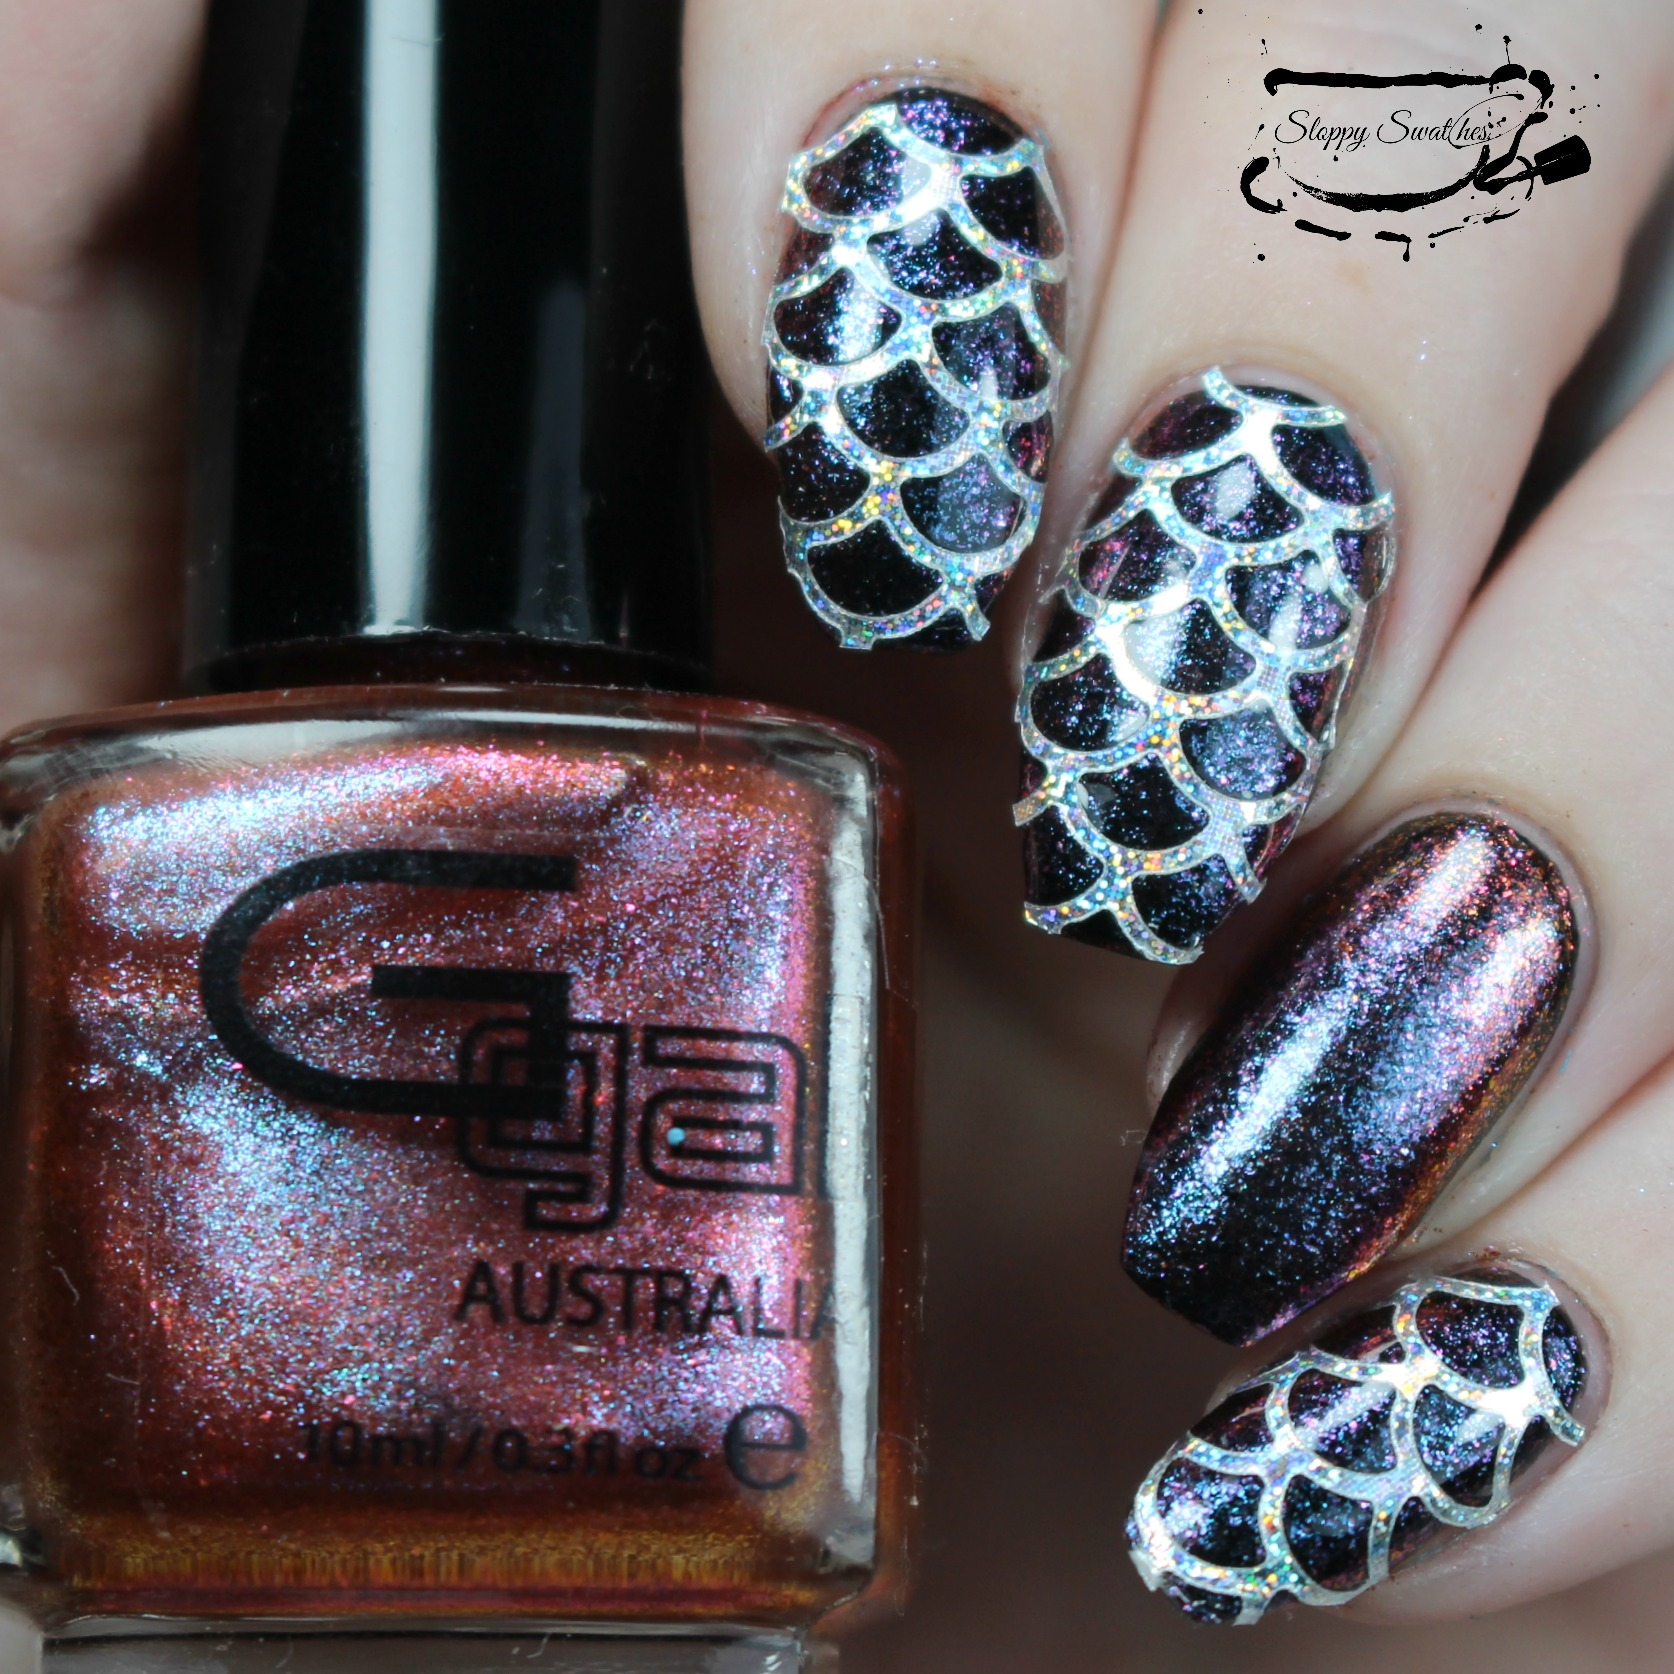 Nailart Mermaid Nails Ft Easy Peel From Nail Experiments Nail Art And Swatches